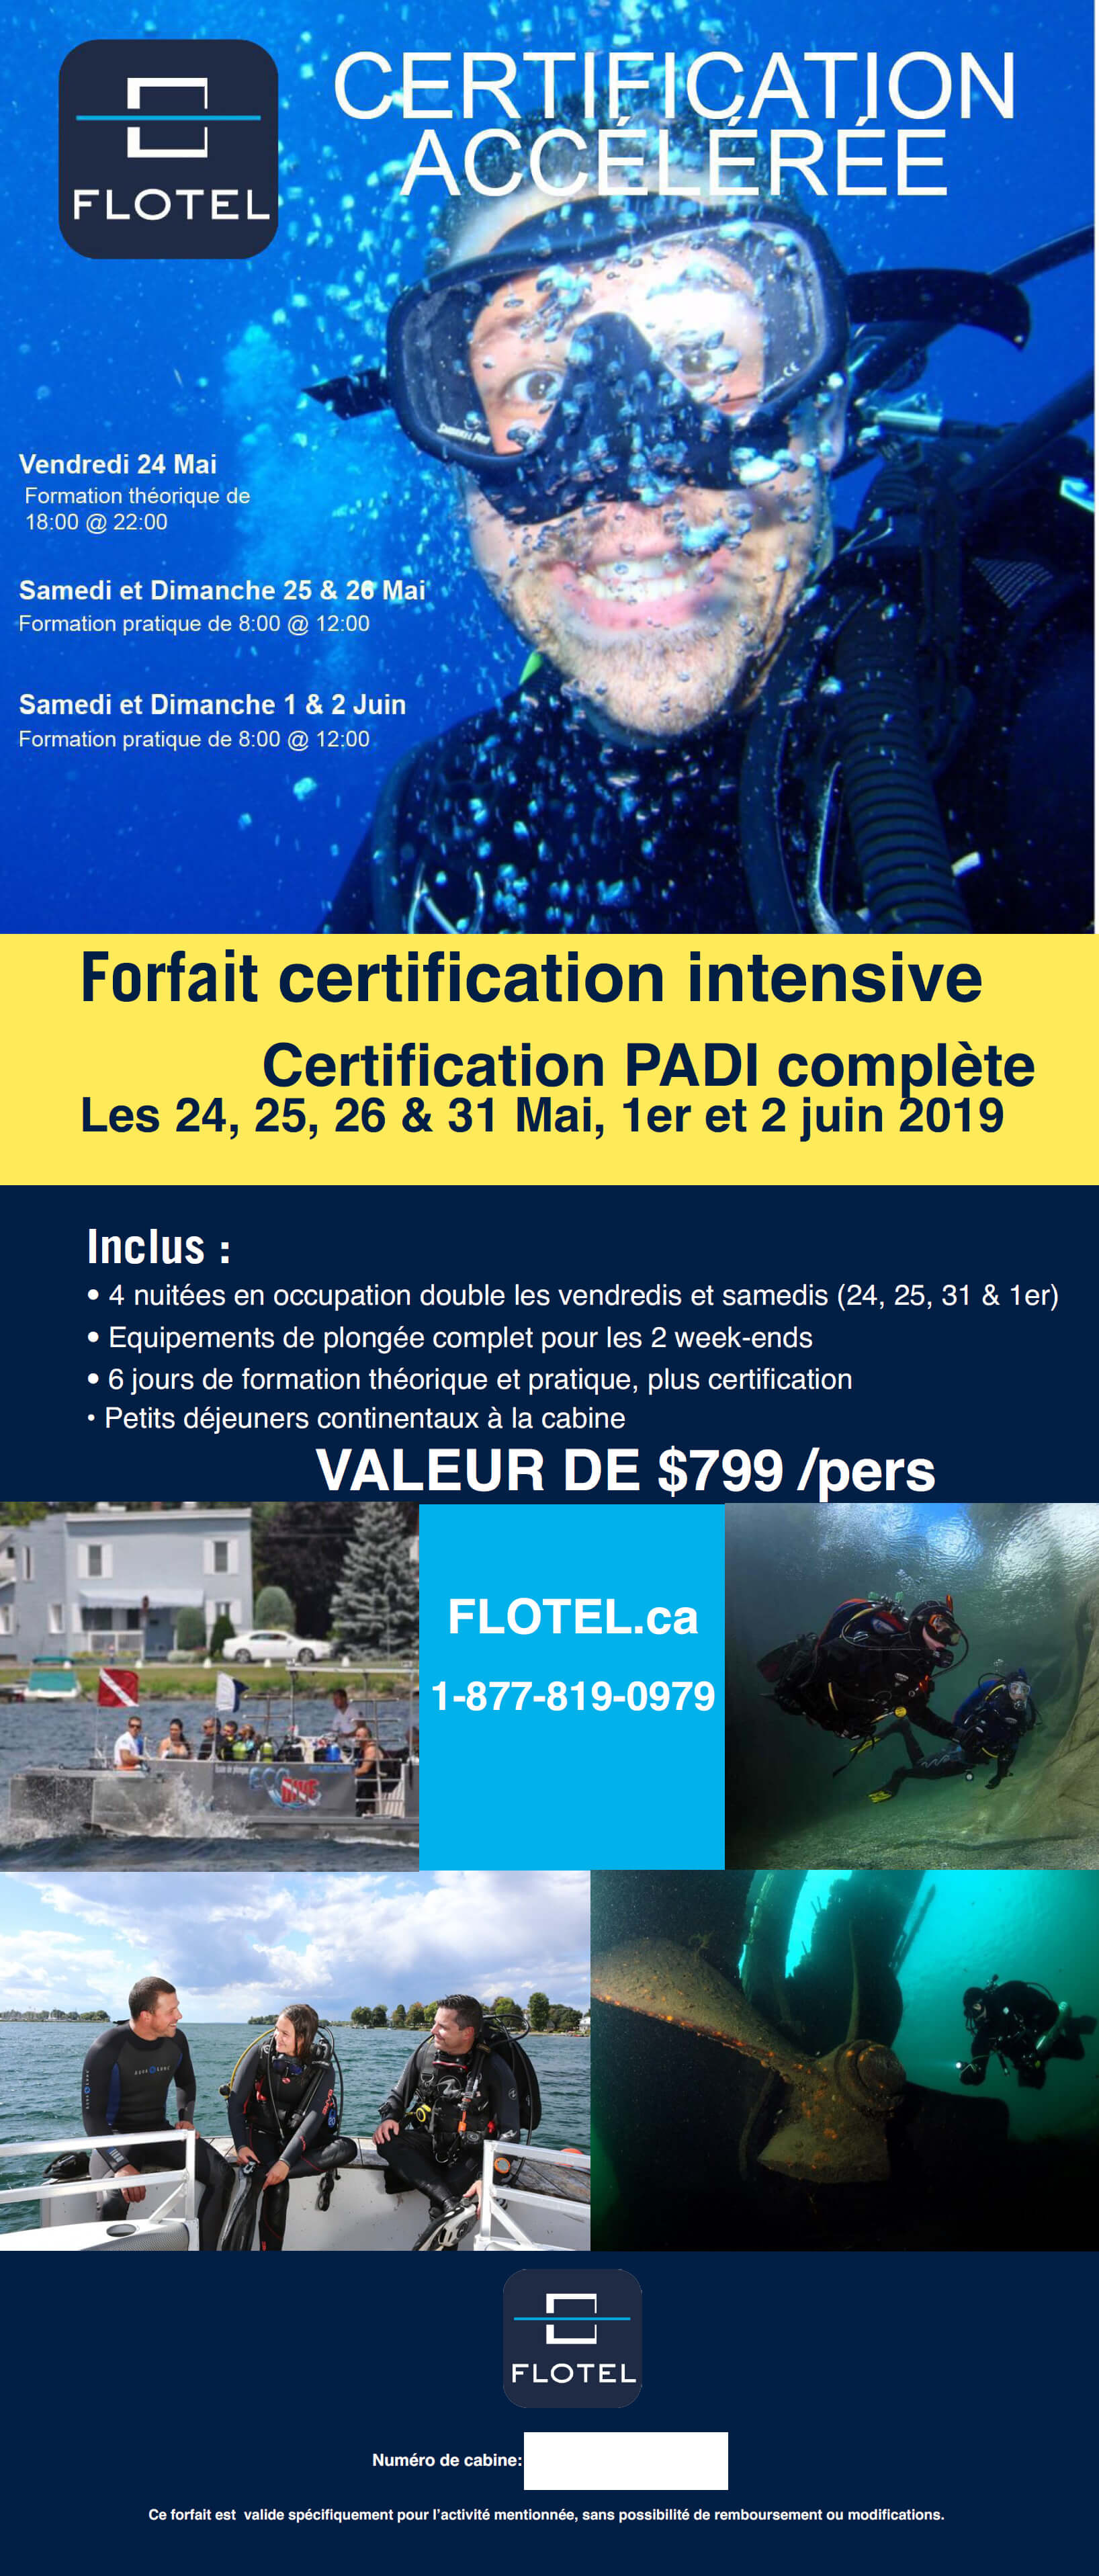 Forfait Plongee Certification Flotel Inc